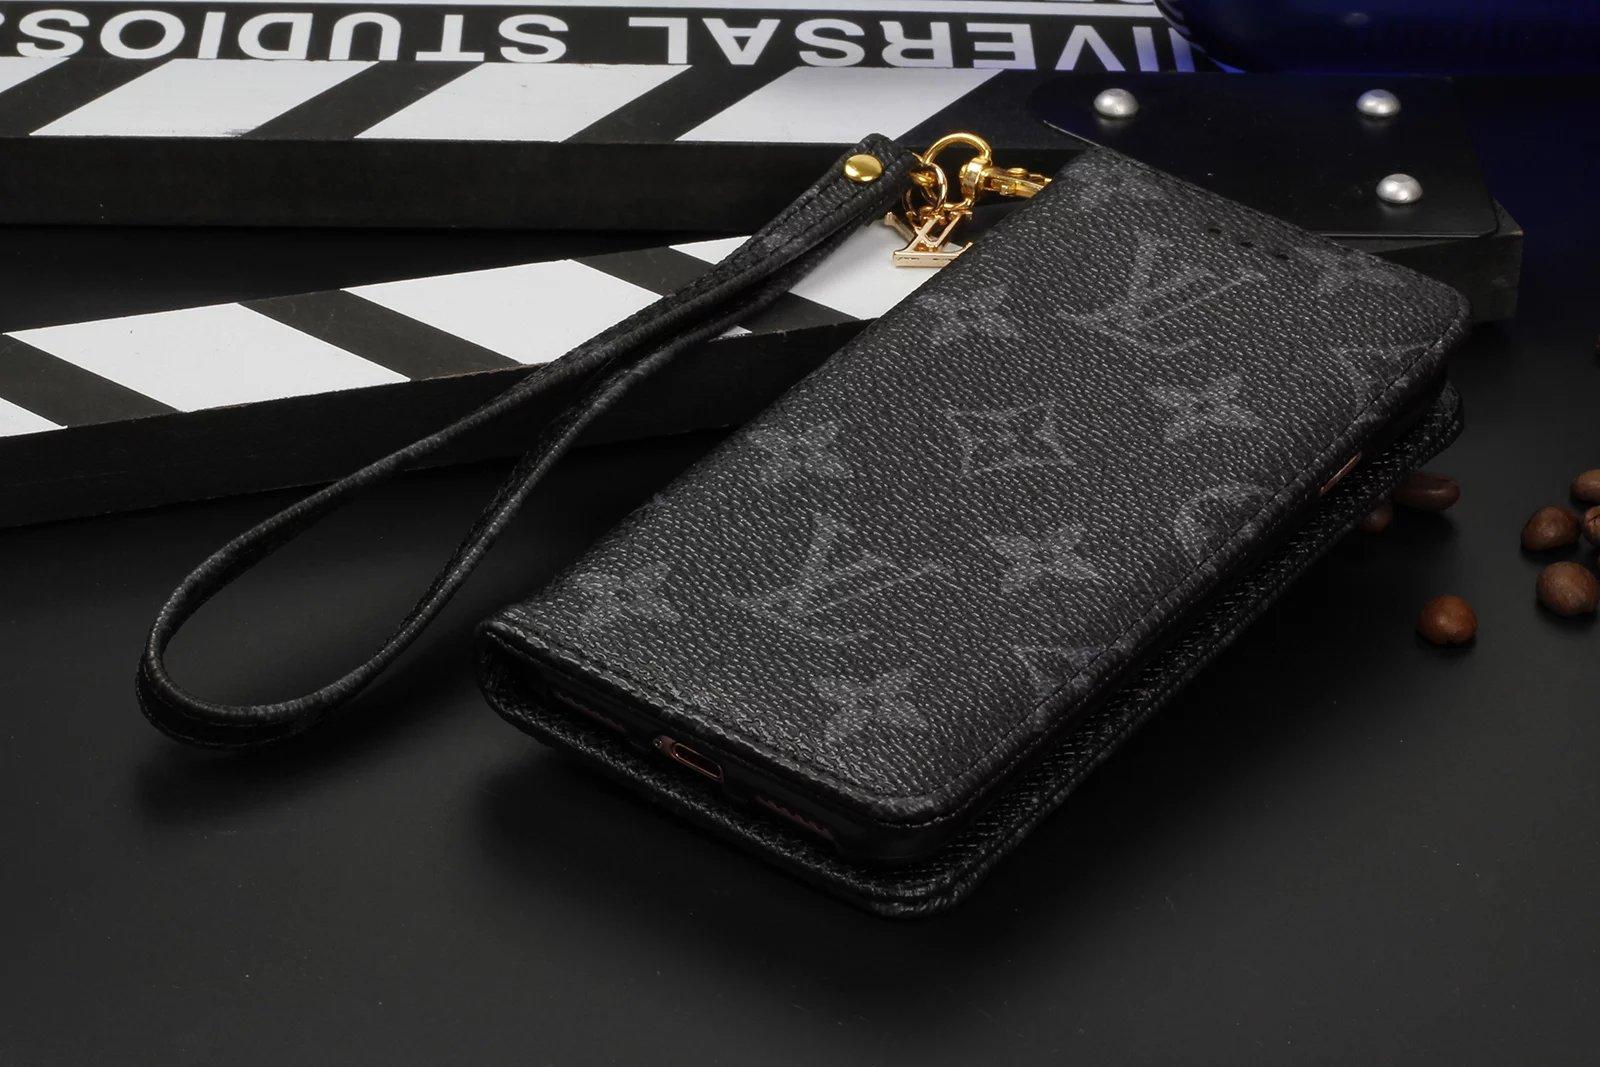 iphone gummihülle die besten iphone hüllen Louis Vuitton iphone6s hülle gummihülle iphone 6s iphone 6s kas6sttenhülle iphone cover foto handyhülle iphone 6s holz ca6s iphone 6s leder silikon hülle 6slber machen